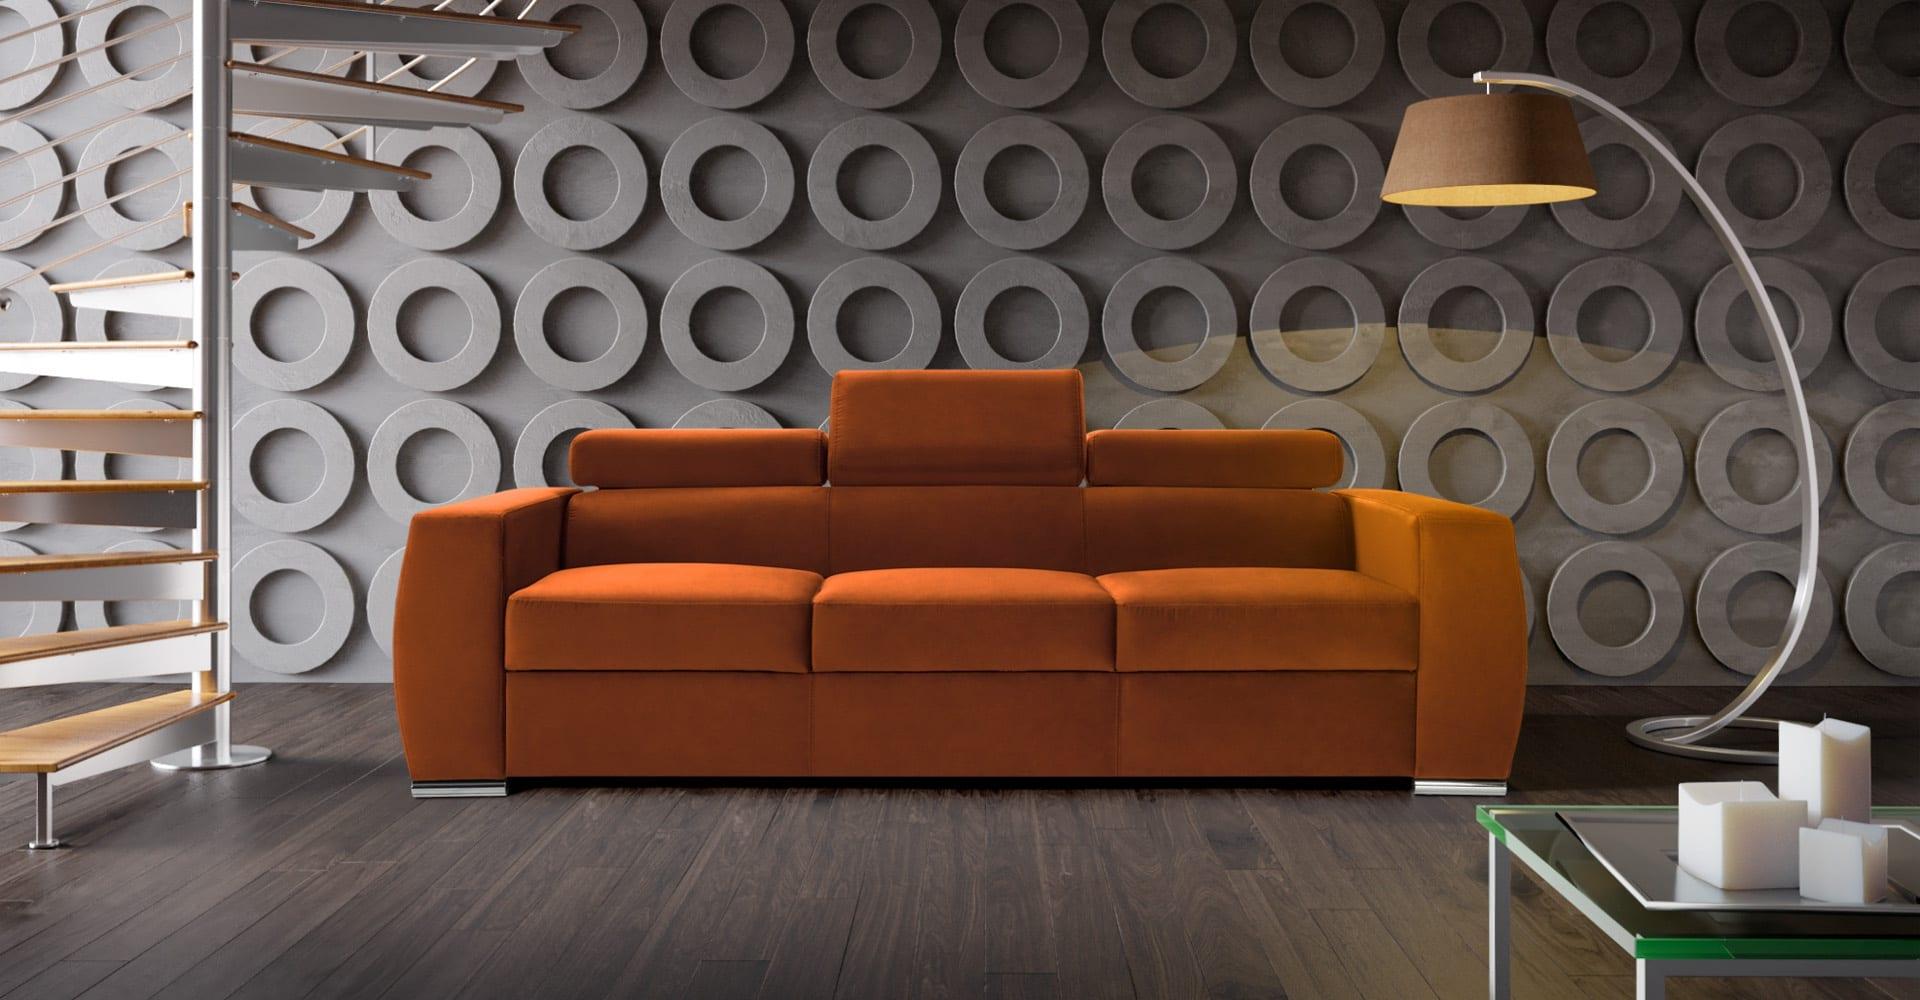 Salon meblowy Mebest Poznan, meble Caya Design sofa Vento